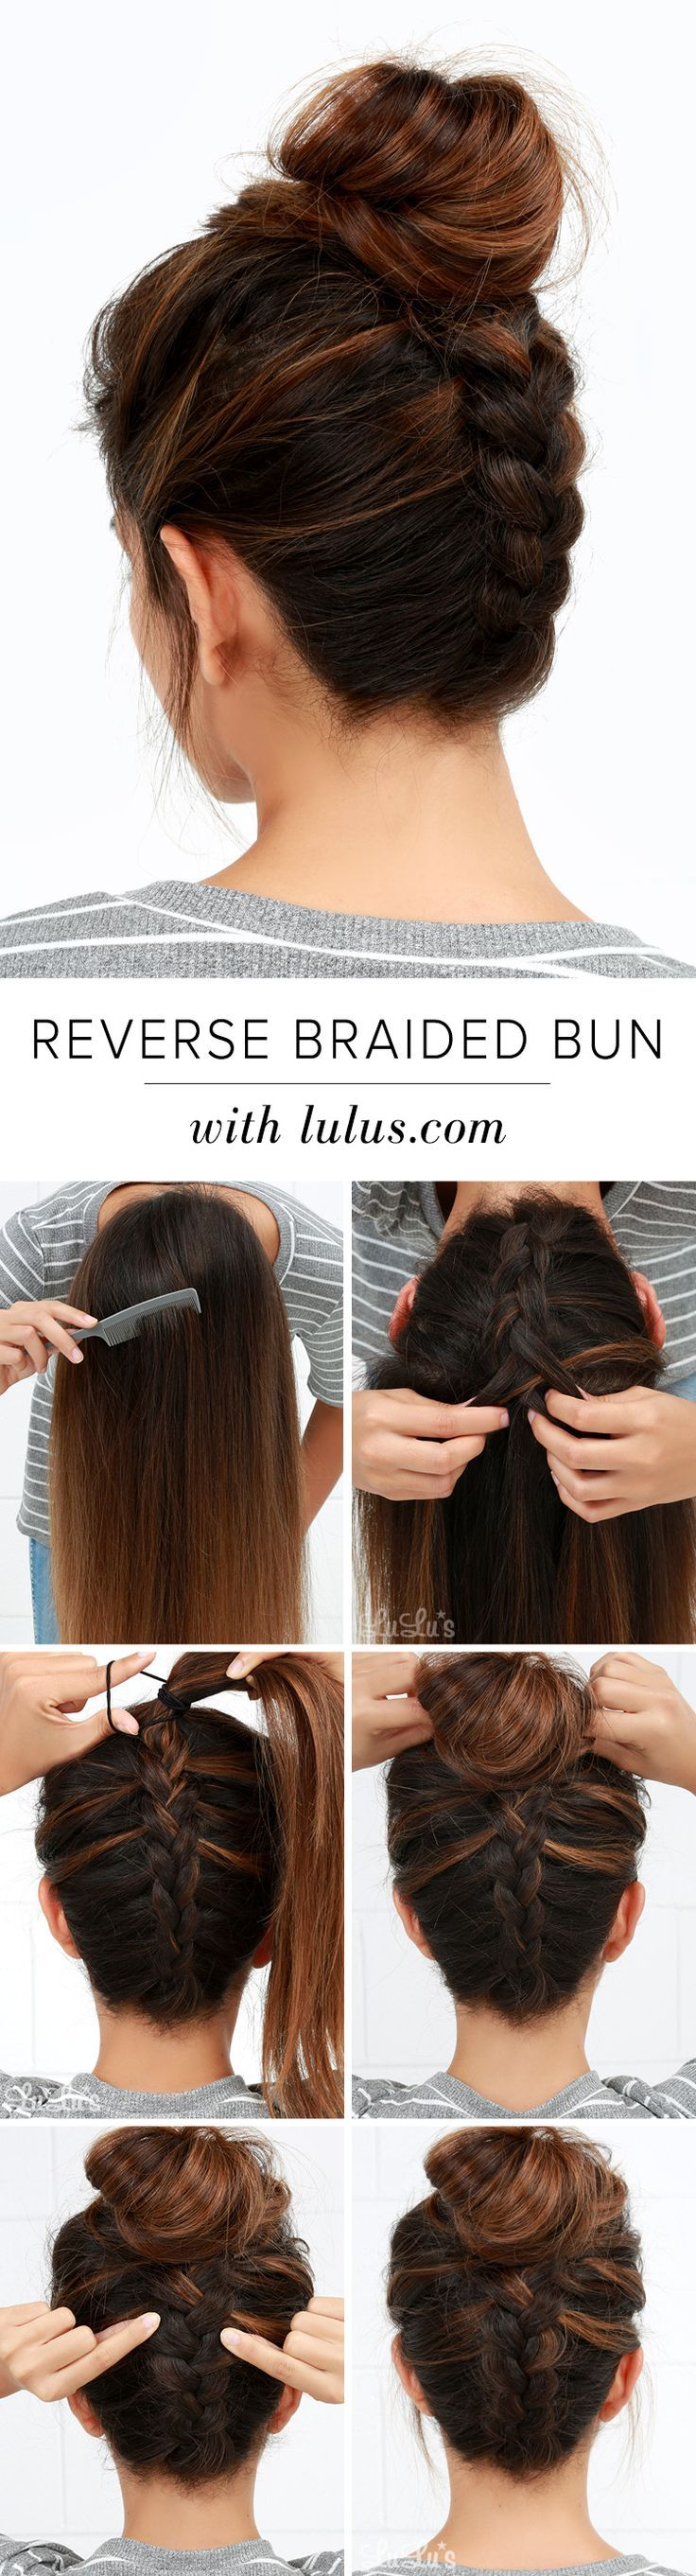 Lulus How To Reverse Braided Bun Hair Tutorial Hair Styles Tips